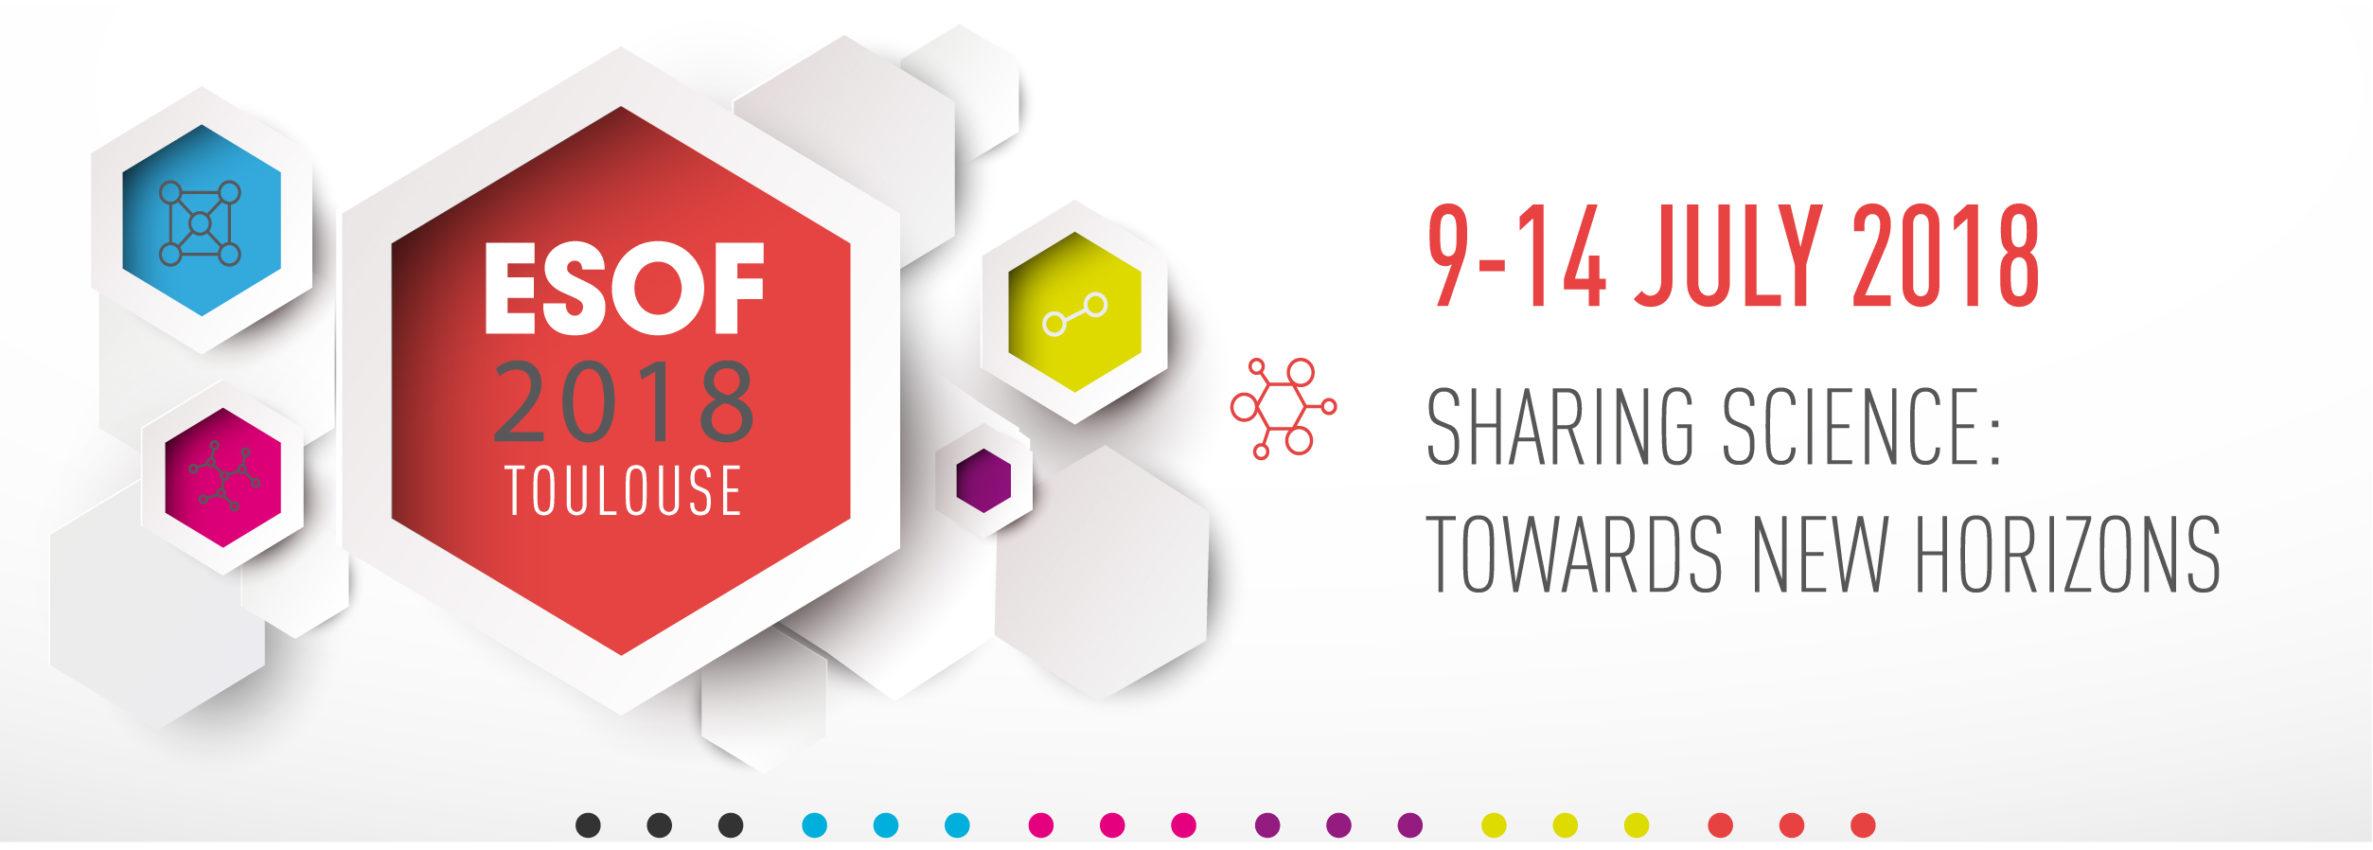 8th ESOF - EuroScience Open Forum